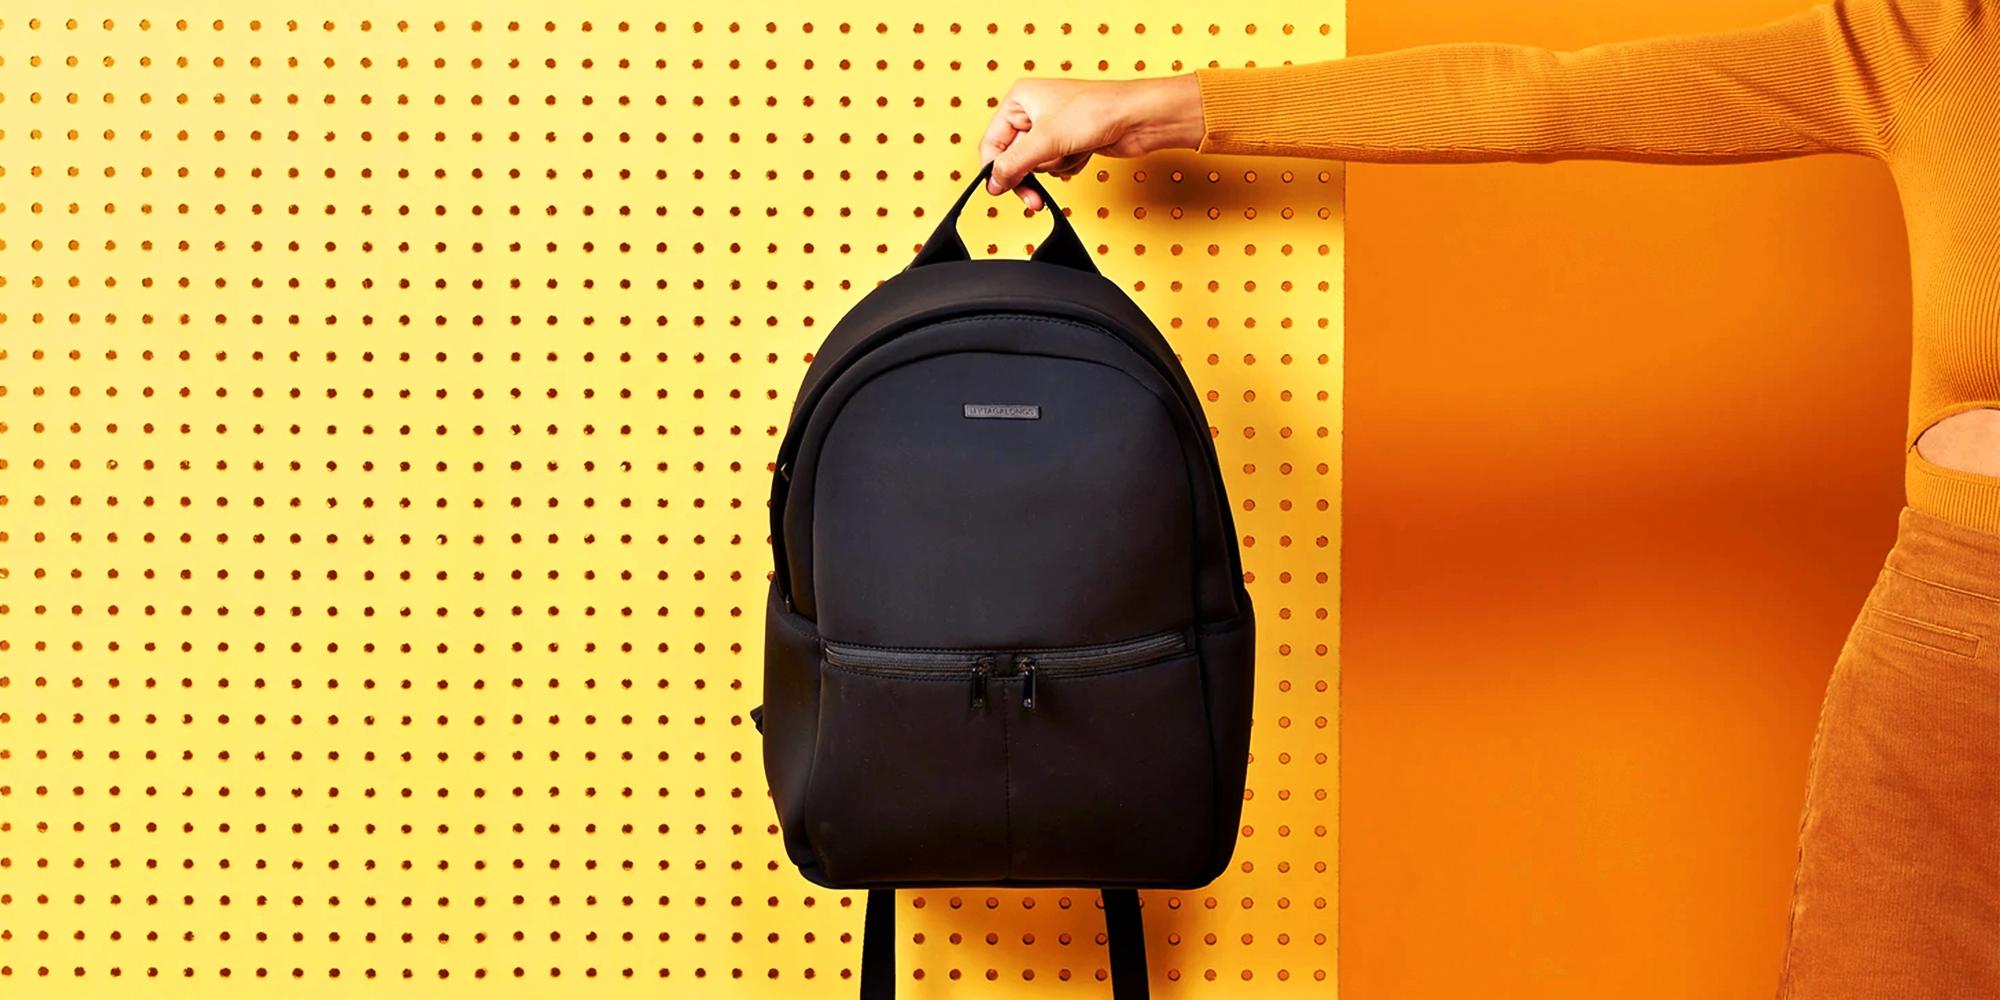 SCHOOL SPORTS GYM PE BOOK TRIP JOB LOT 50 BLACK NYLON DRAWSTRING RUCKSACK BAGS